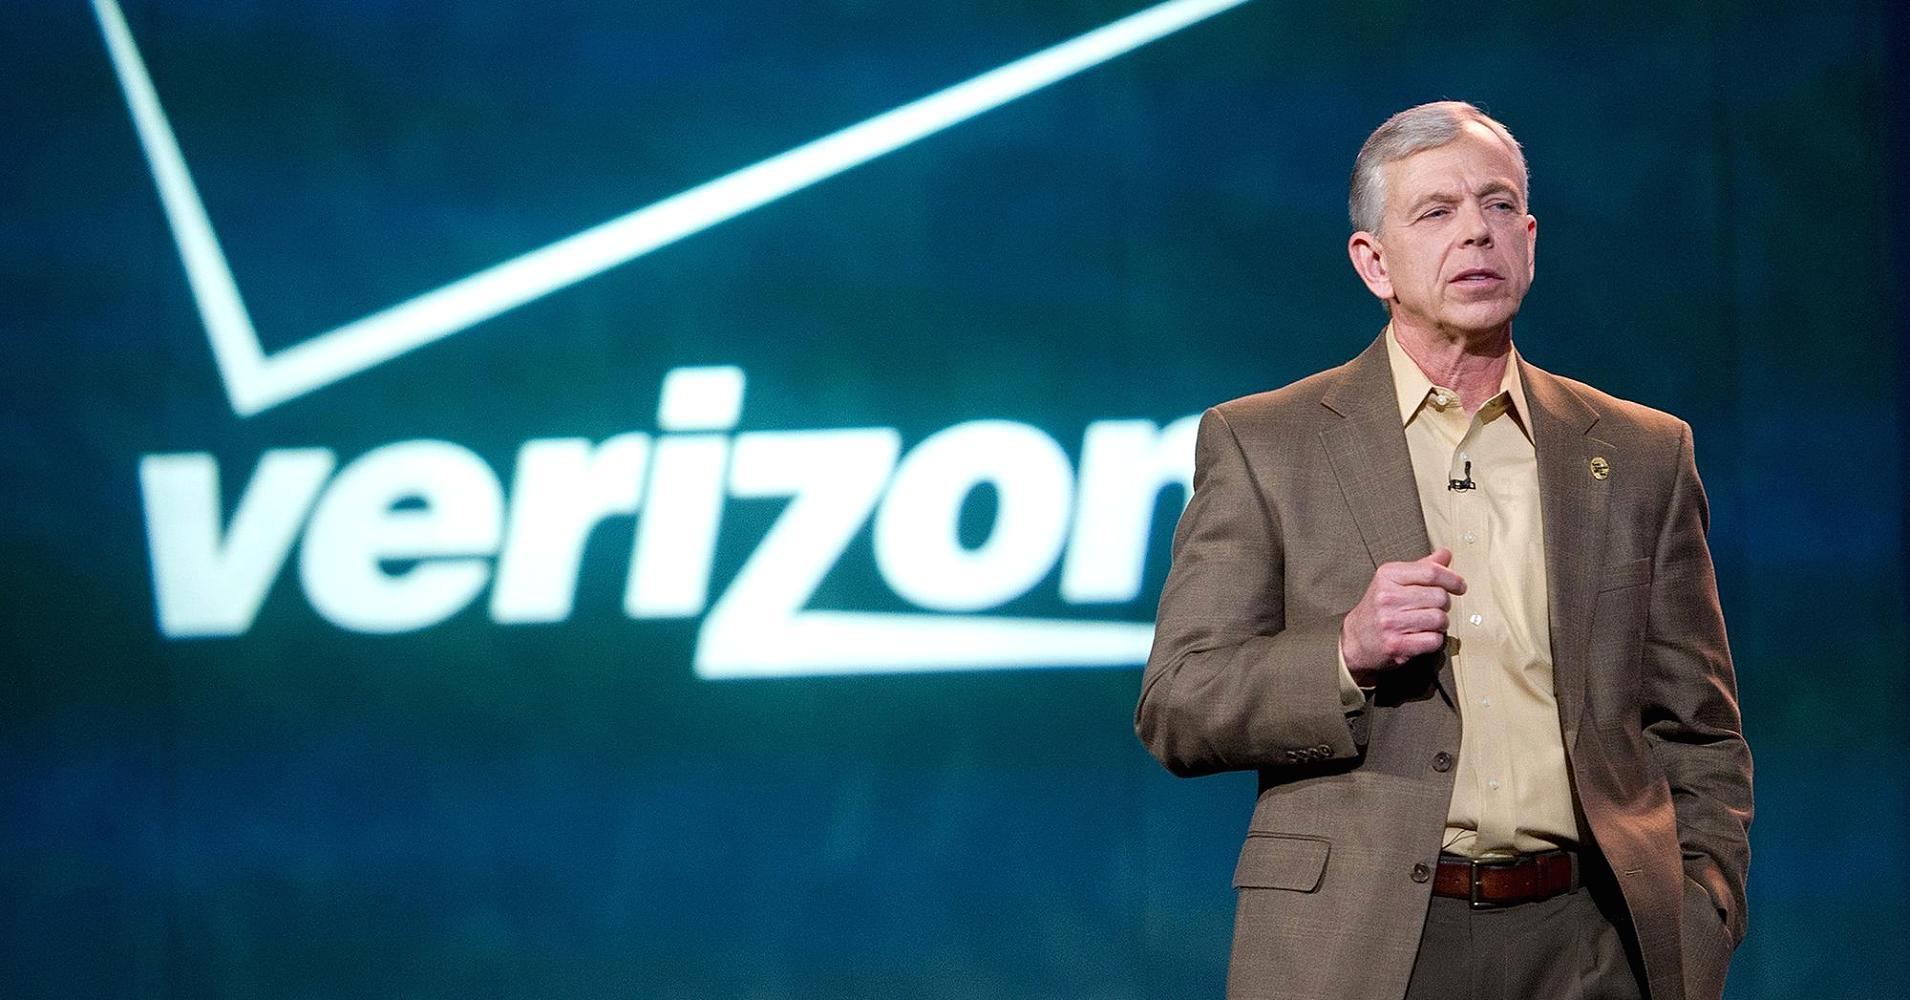 Yahoo slideshow 13 - Verizon CEO Lowell McAdam